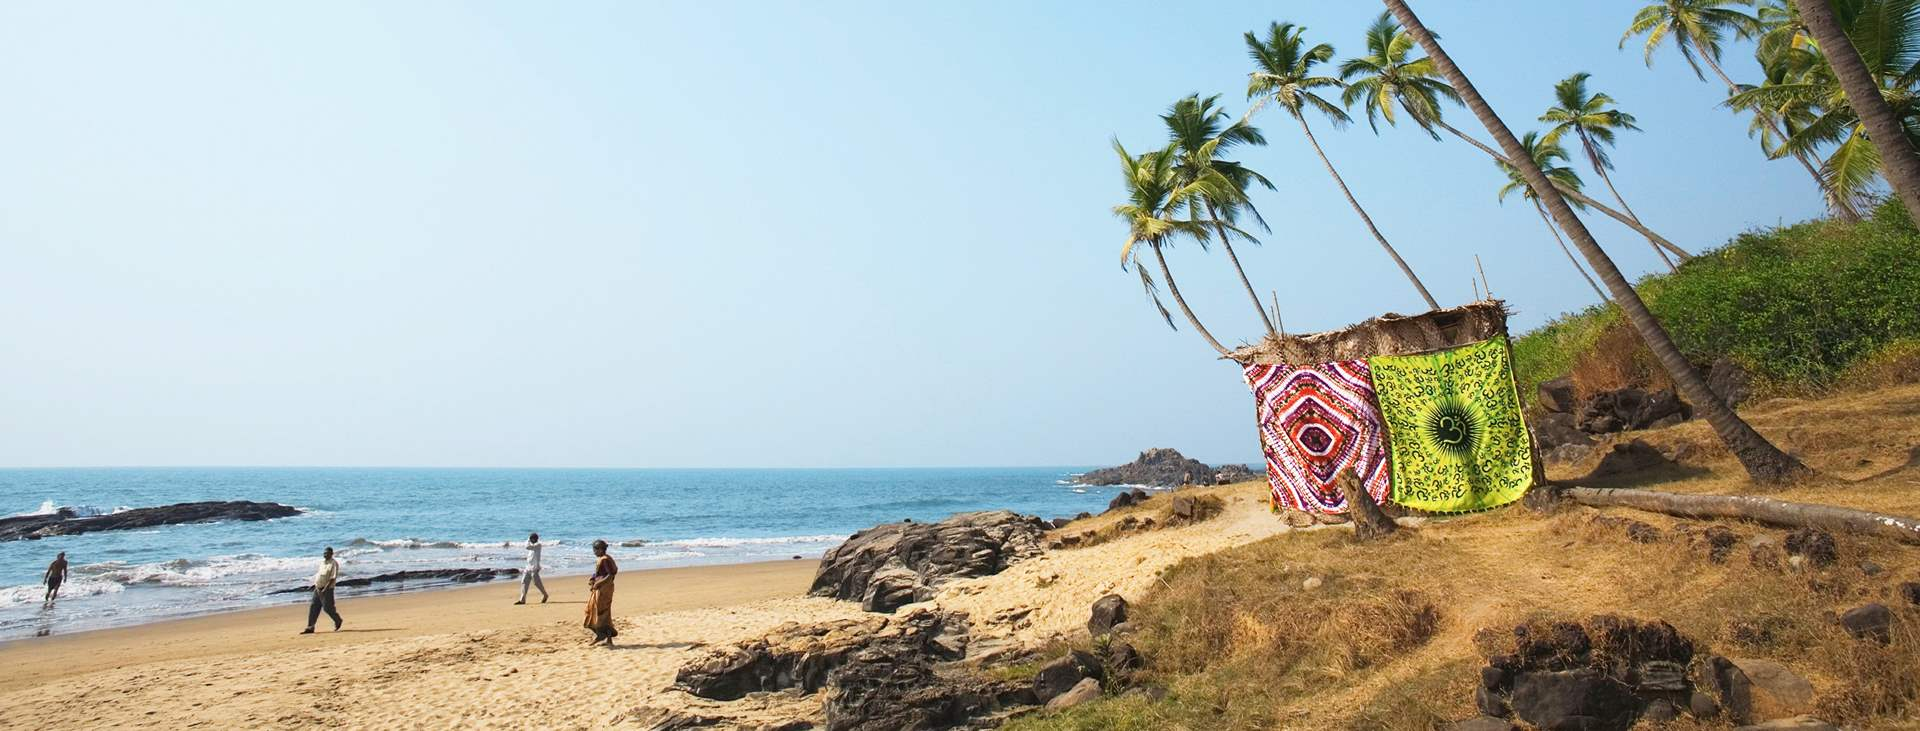 Boka en resa till Norra Goa i Indien med Ving